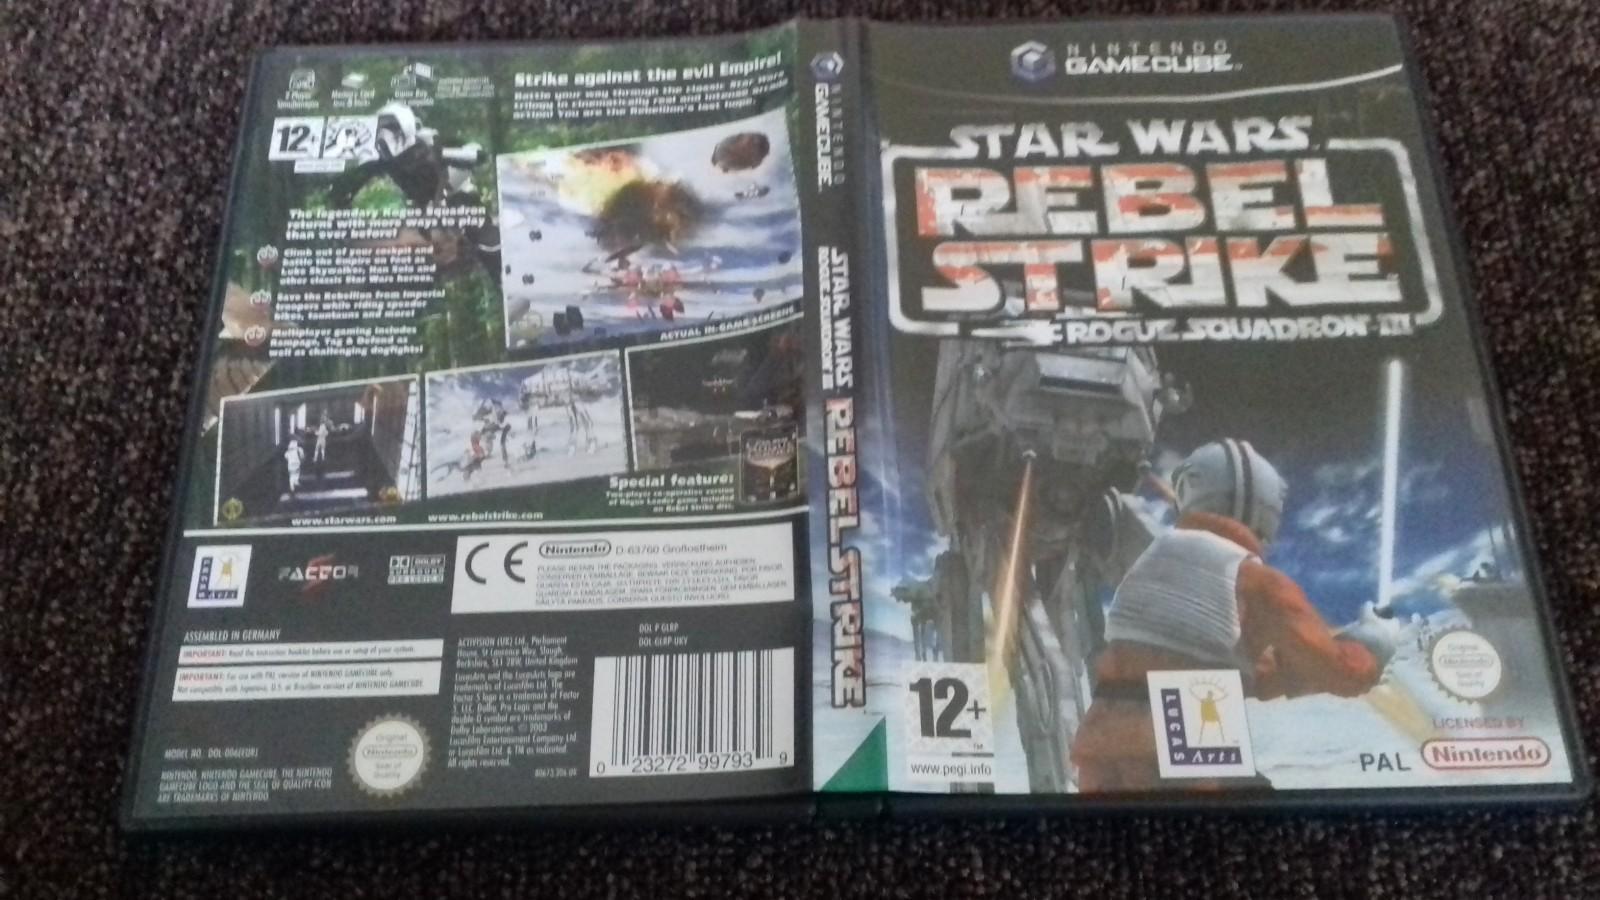 Download Star Wars Rogue Squadron Wallpaper Hd Backgrounds Download Itl Cat